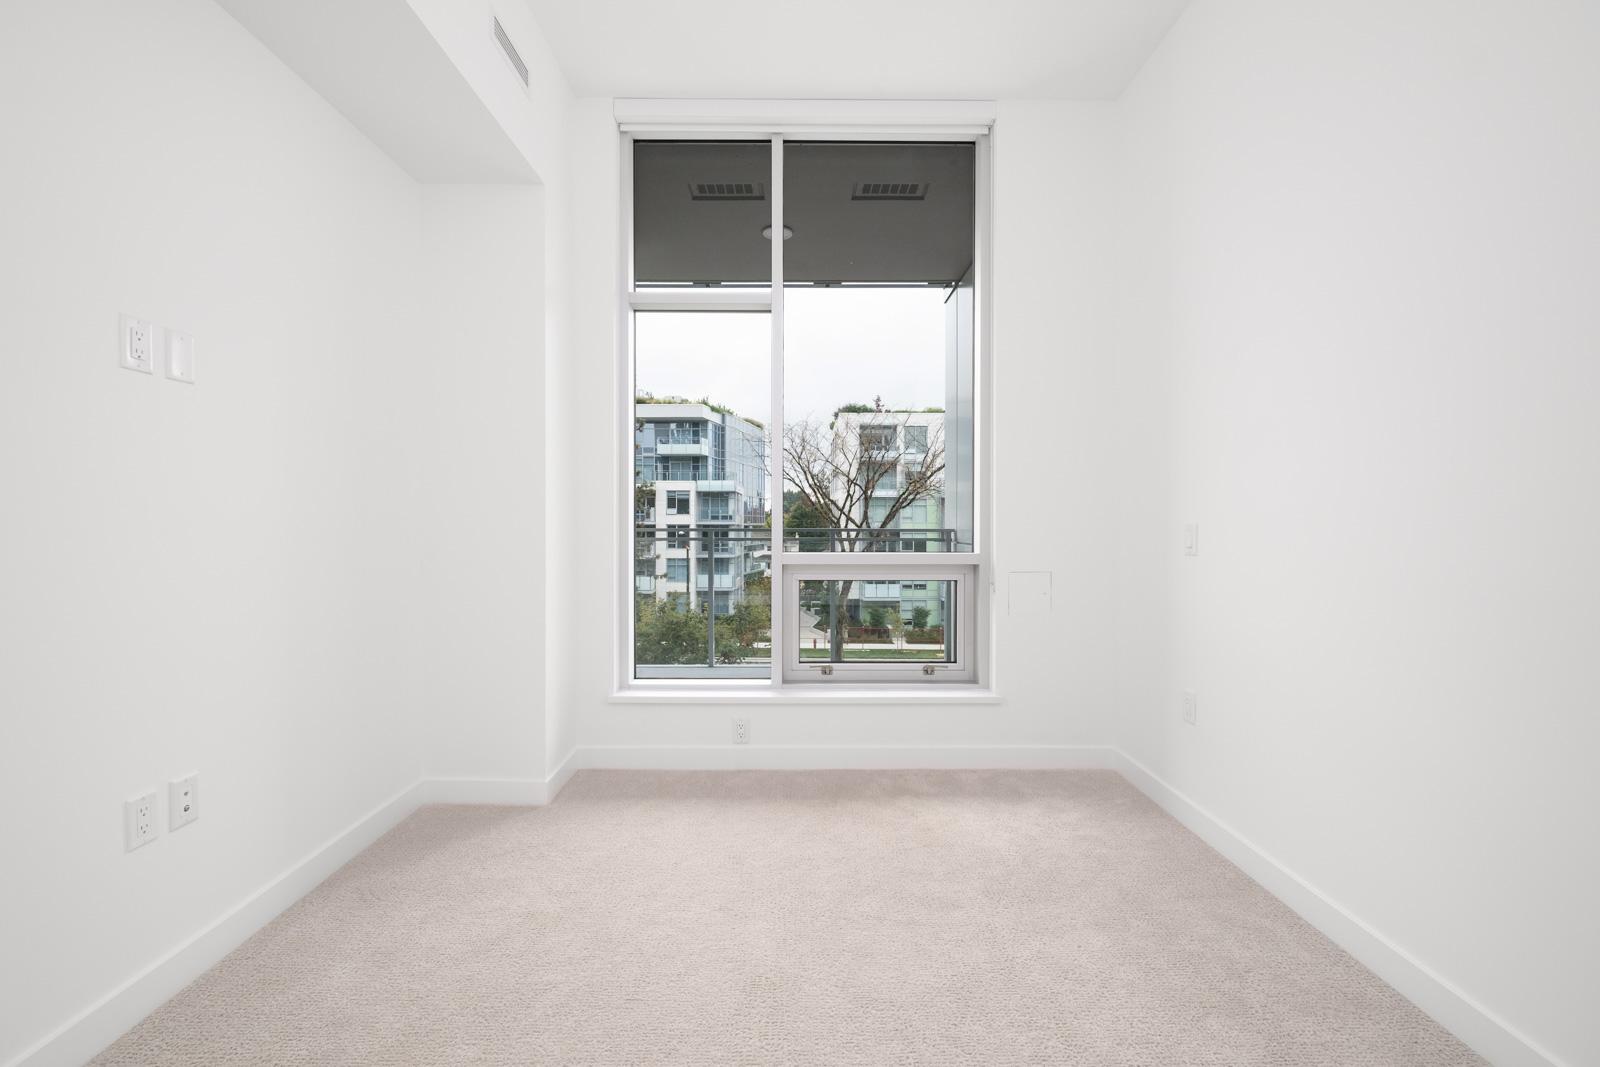 living room with hardwood floors in rental condo in the Cambie Corridor neighbourhood of Vancouver